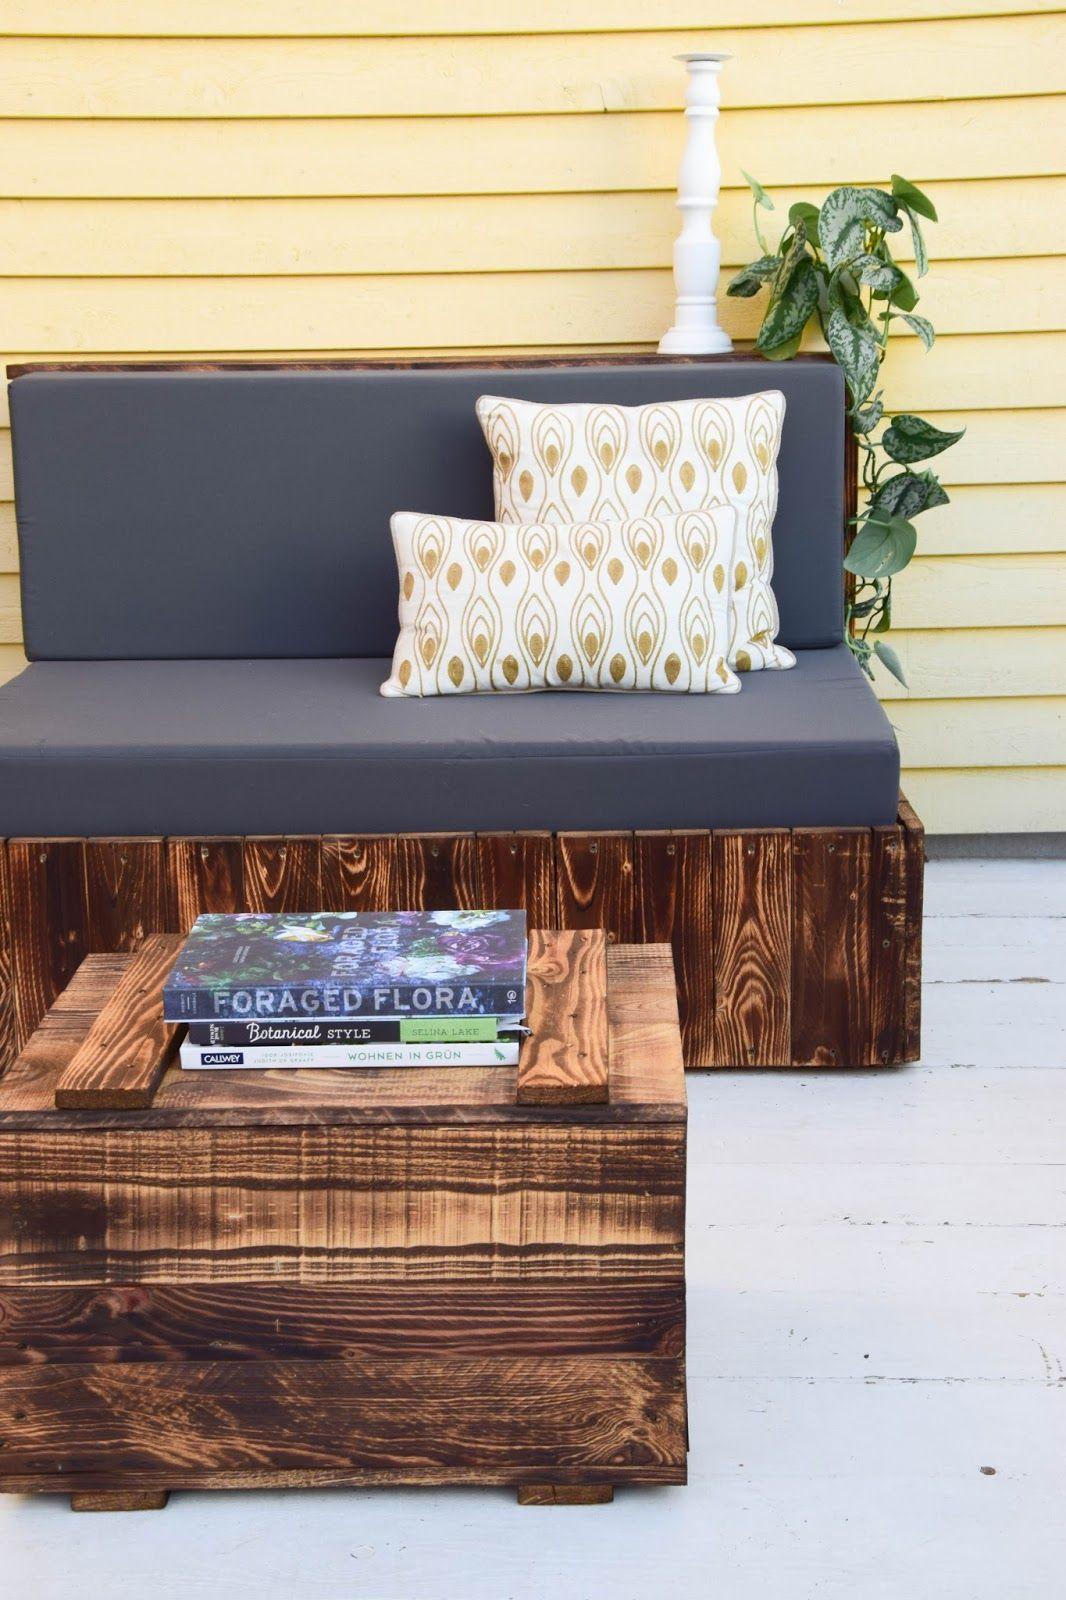 diy paletten sitzm bel f r terrasse dekoidee palettenm bel gestaltung deko garten paletten. Black Bedroom Furniture Sets. Home Design Ideas